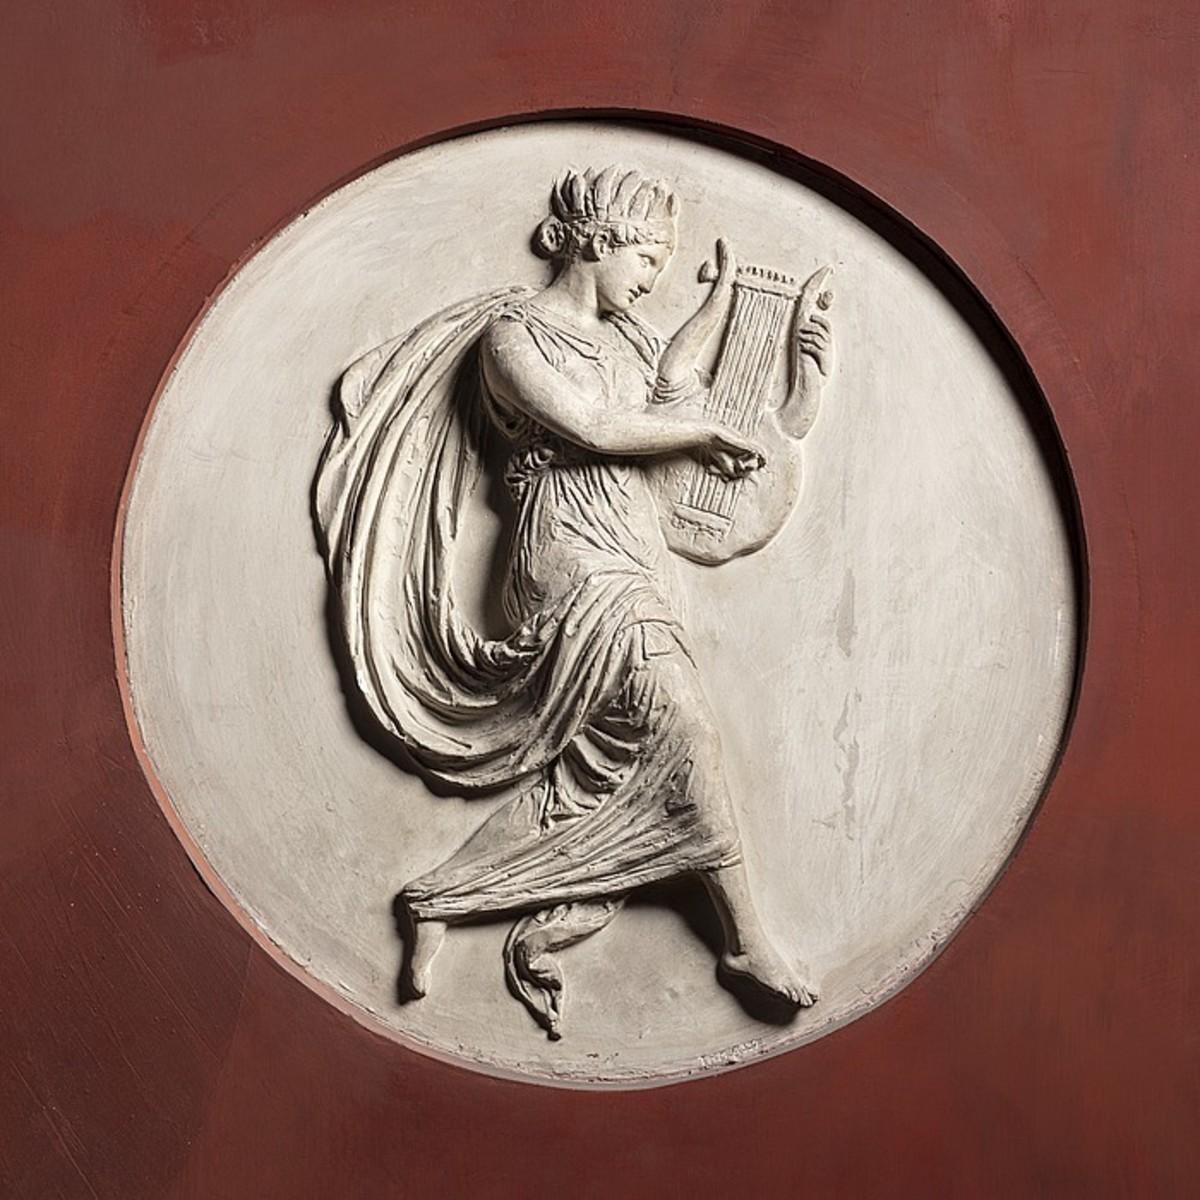 Terpsichore, Muse of Dancing.